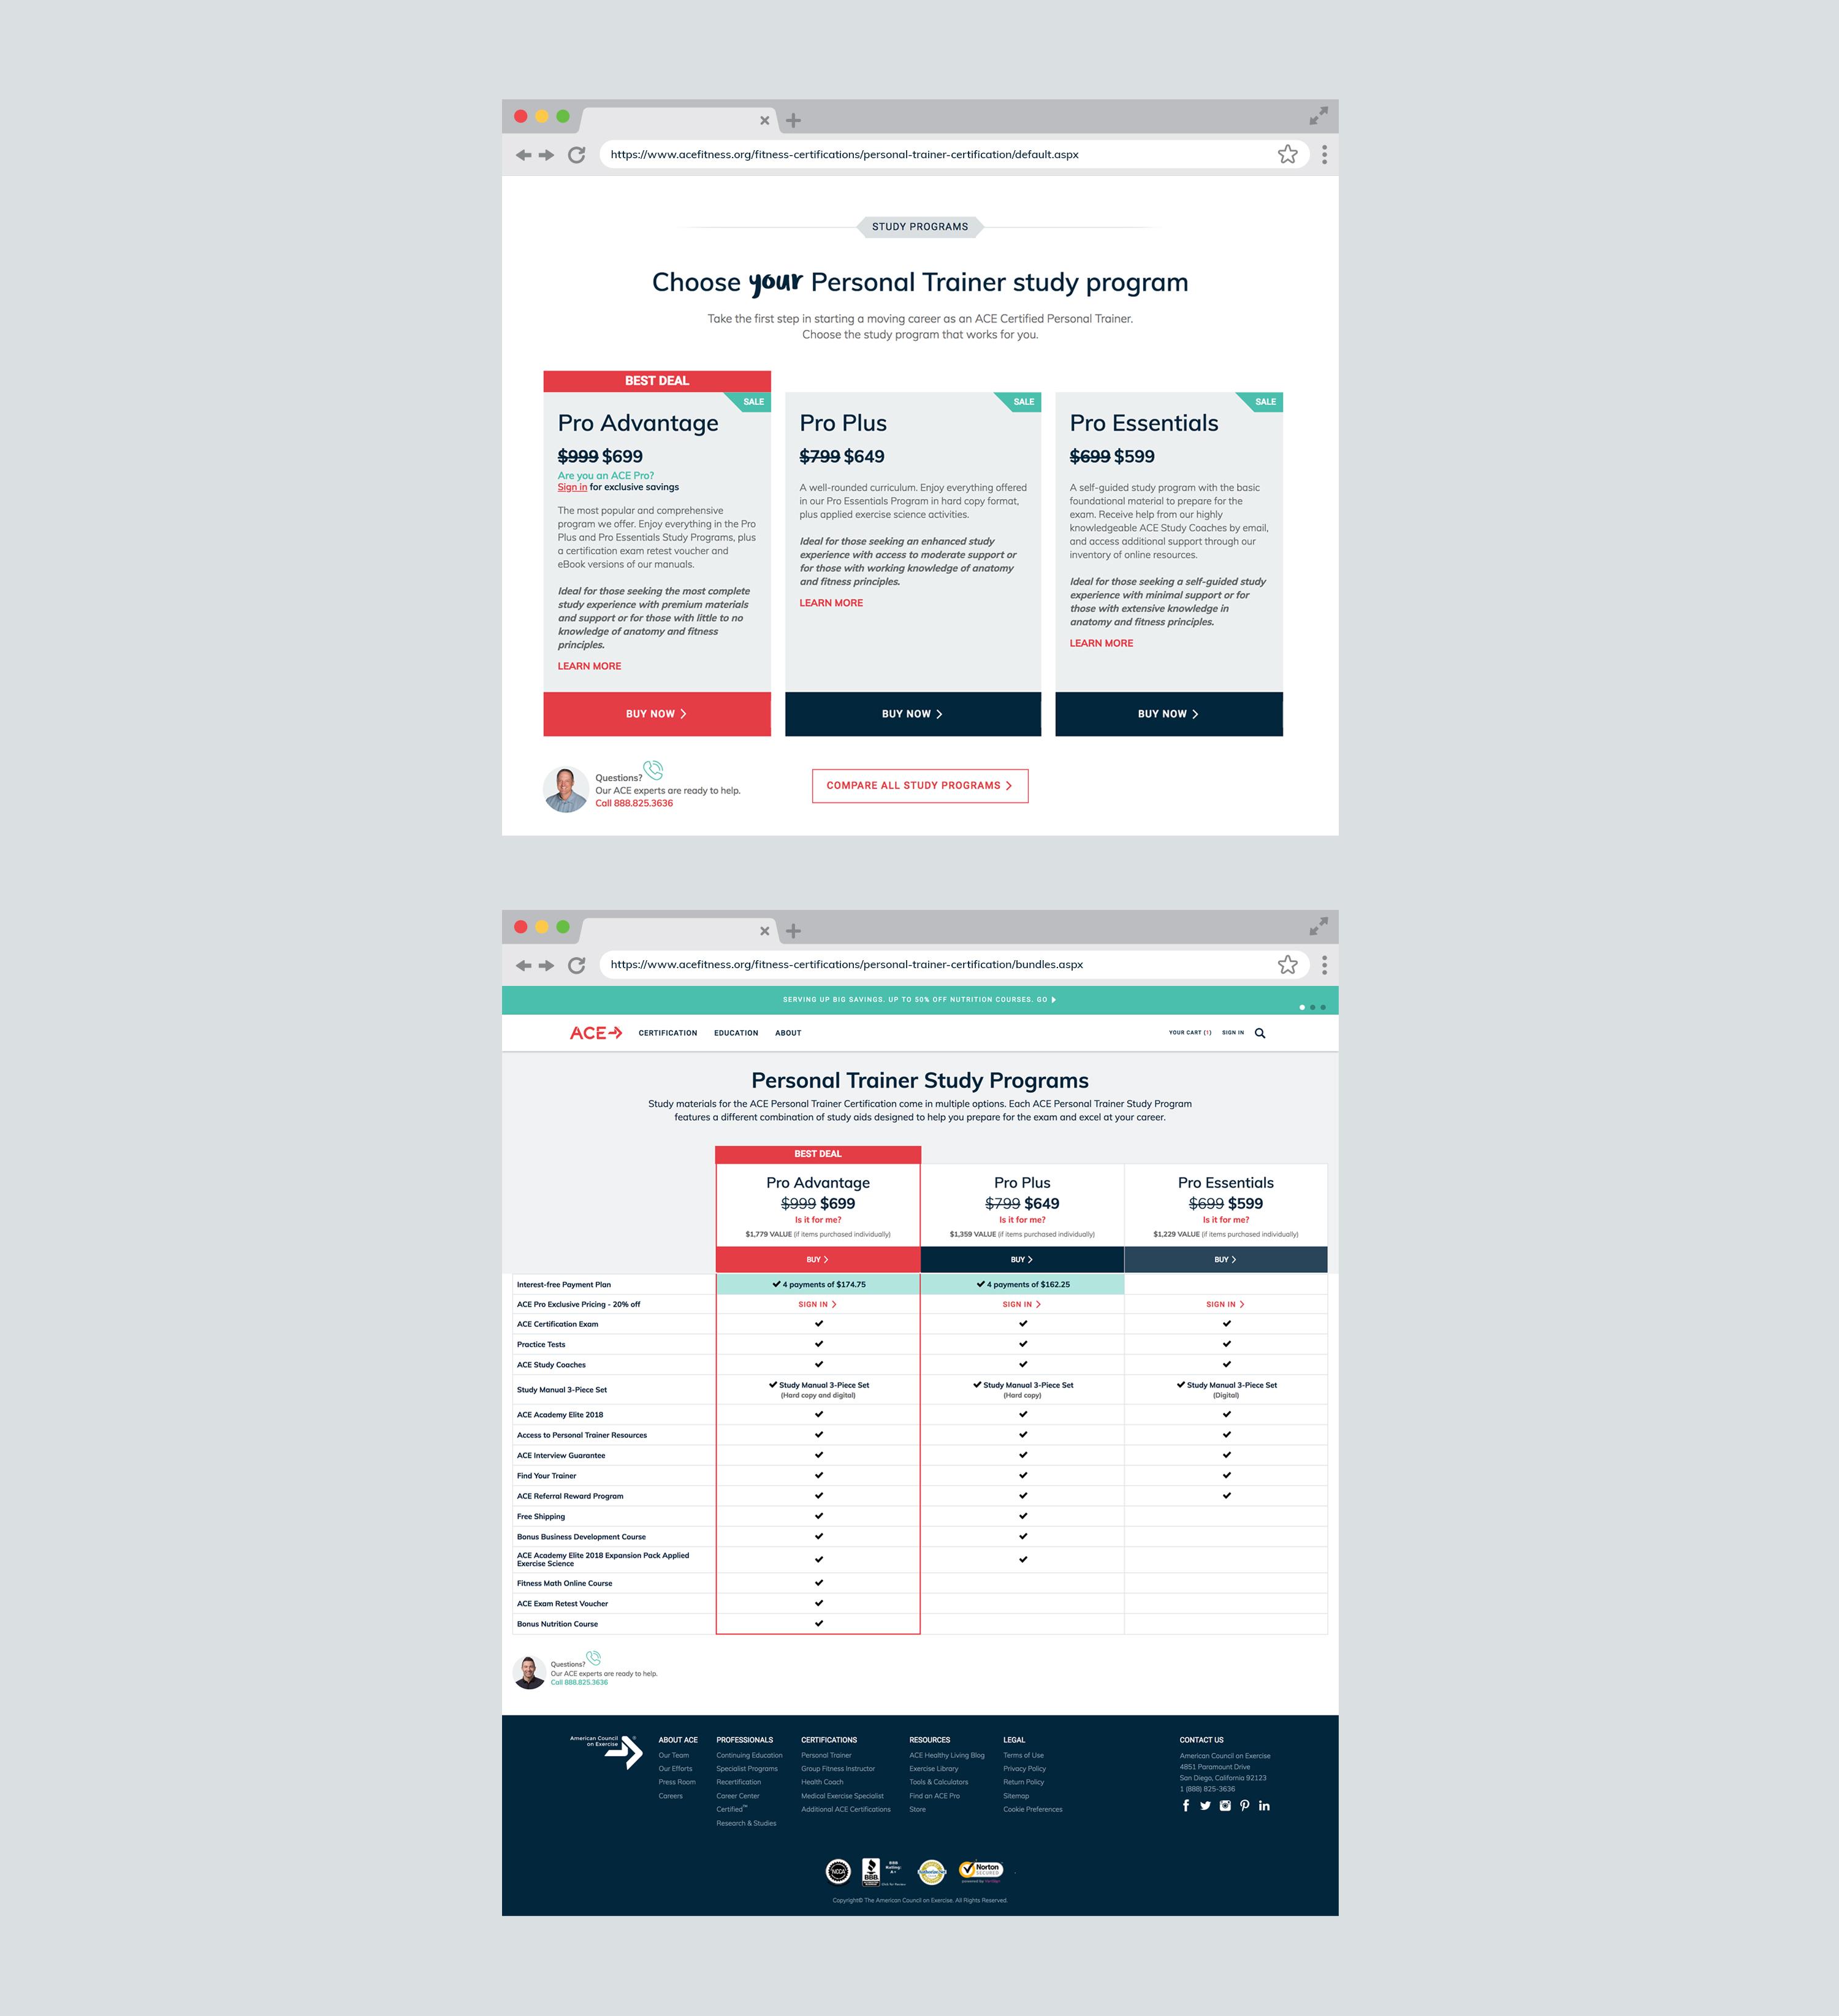 acefitness-pricegrid